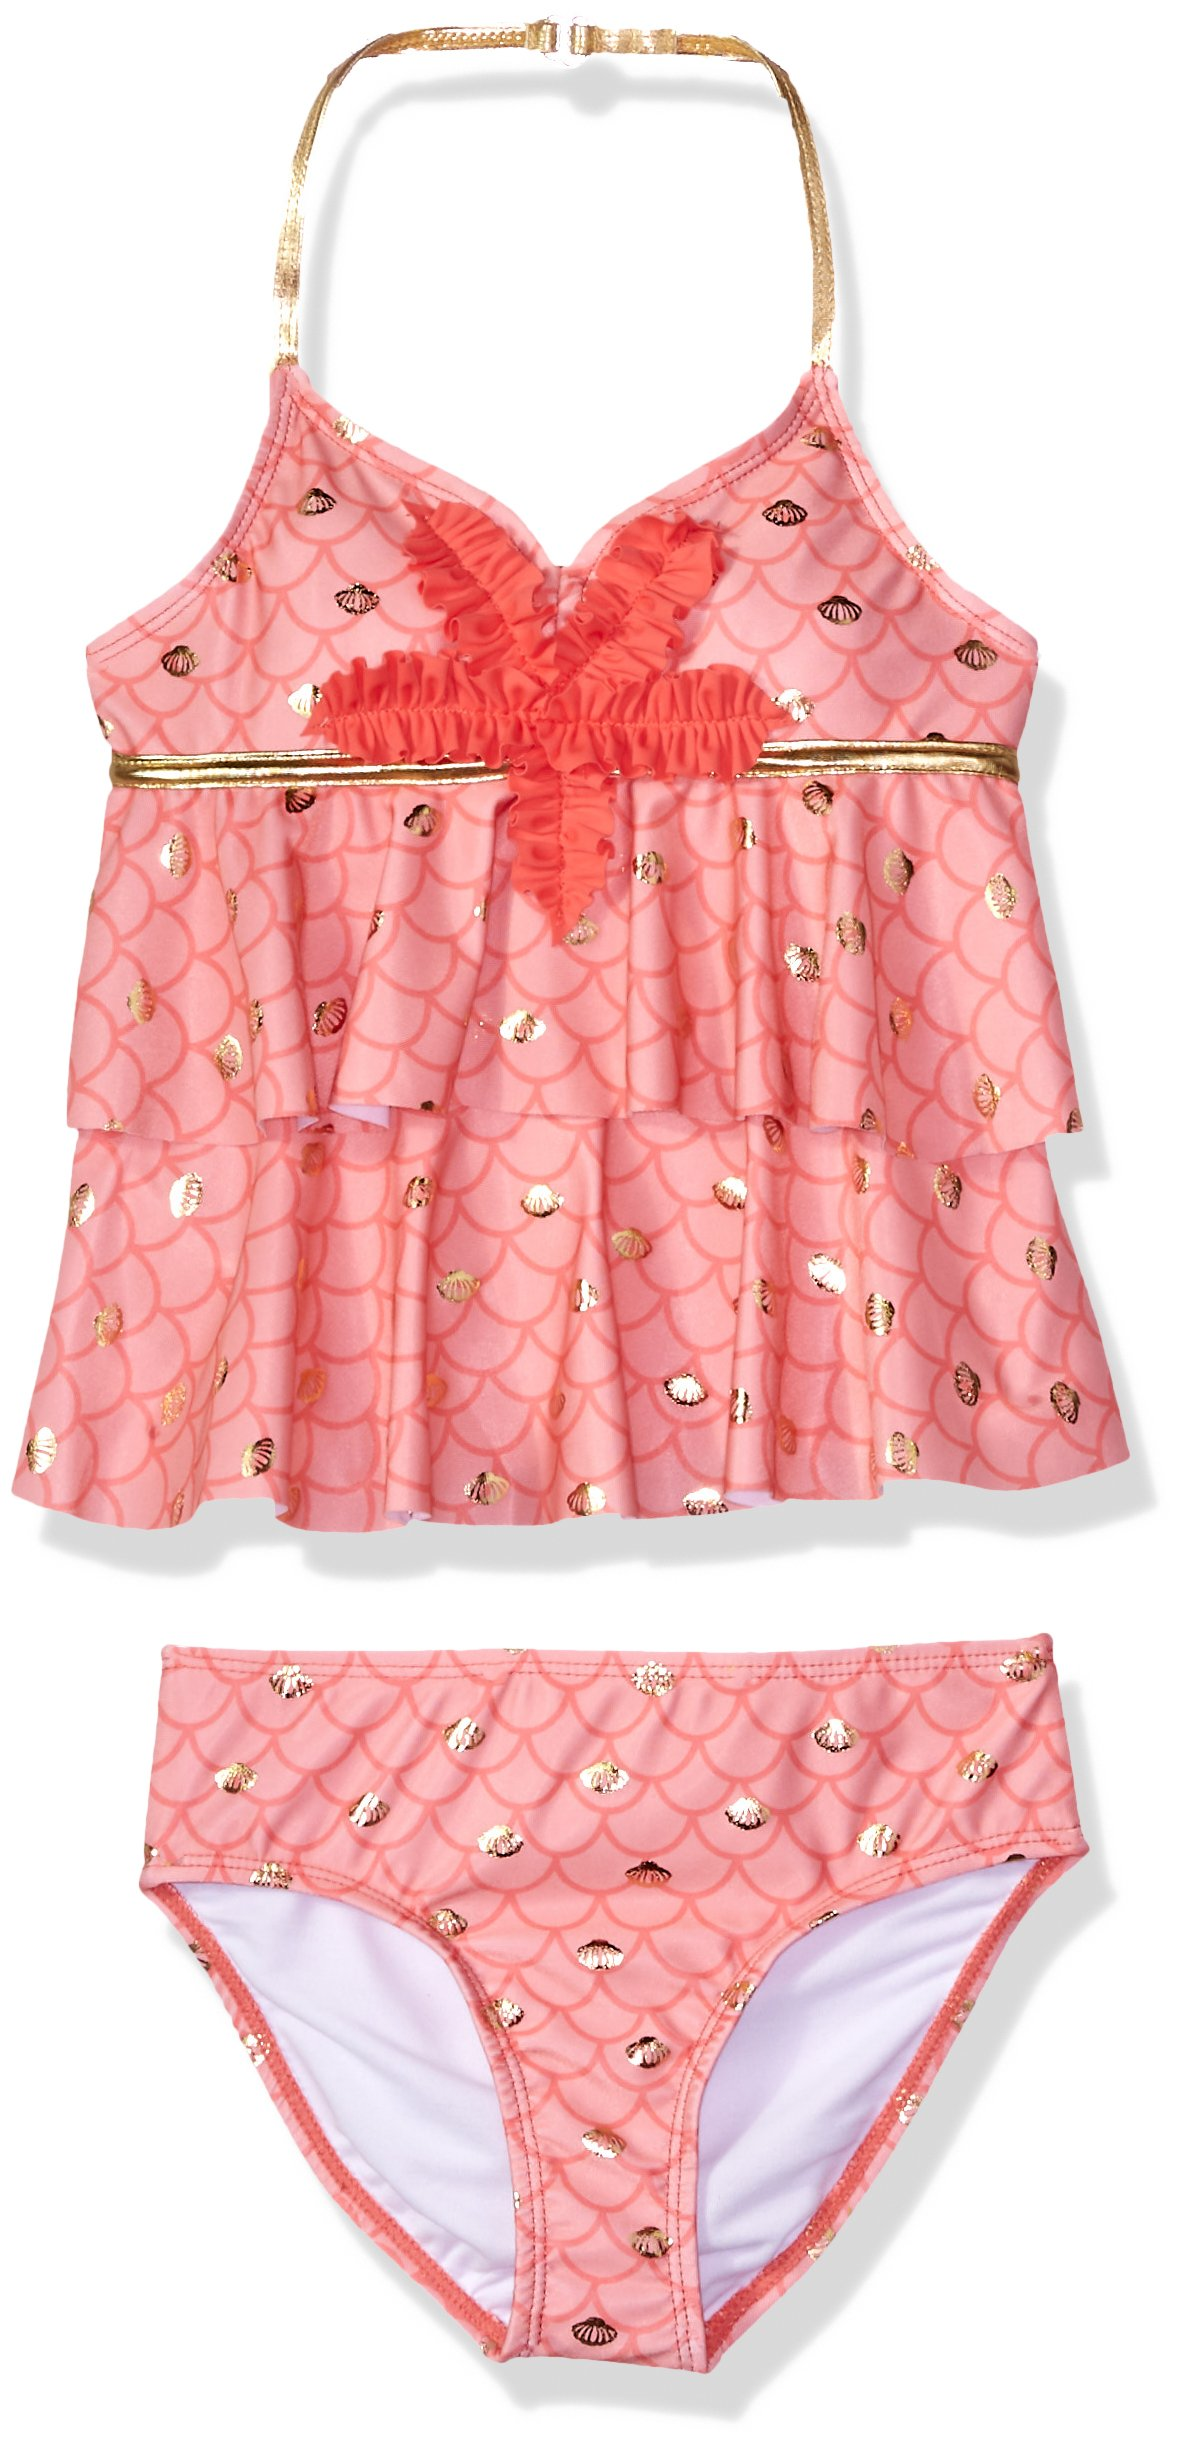 Jantzen Big Girls' Mermaid Ruffle Tankini Swimsuit, Mermaid Coral, 10